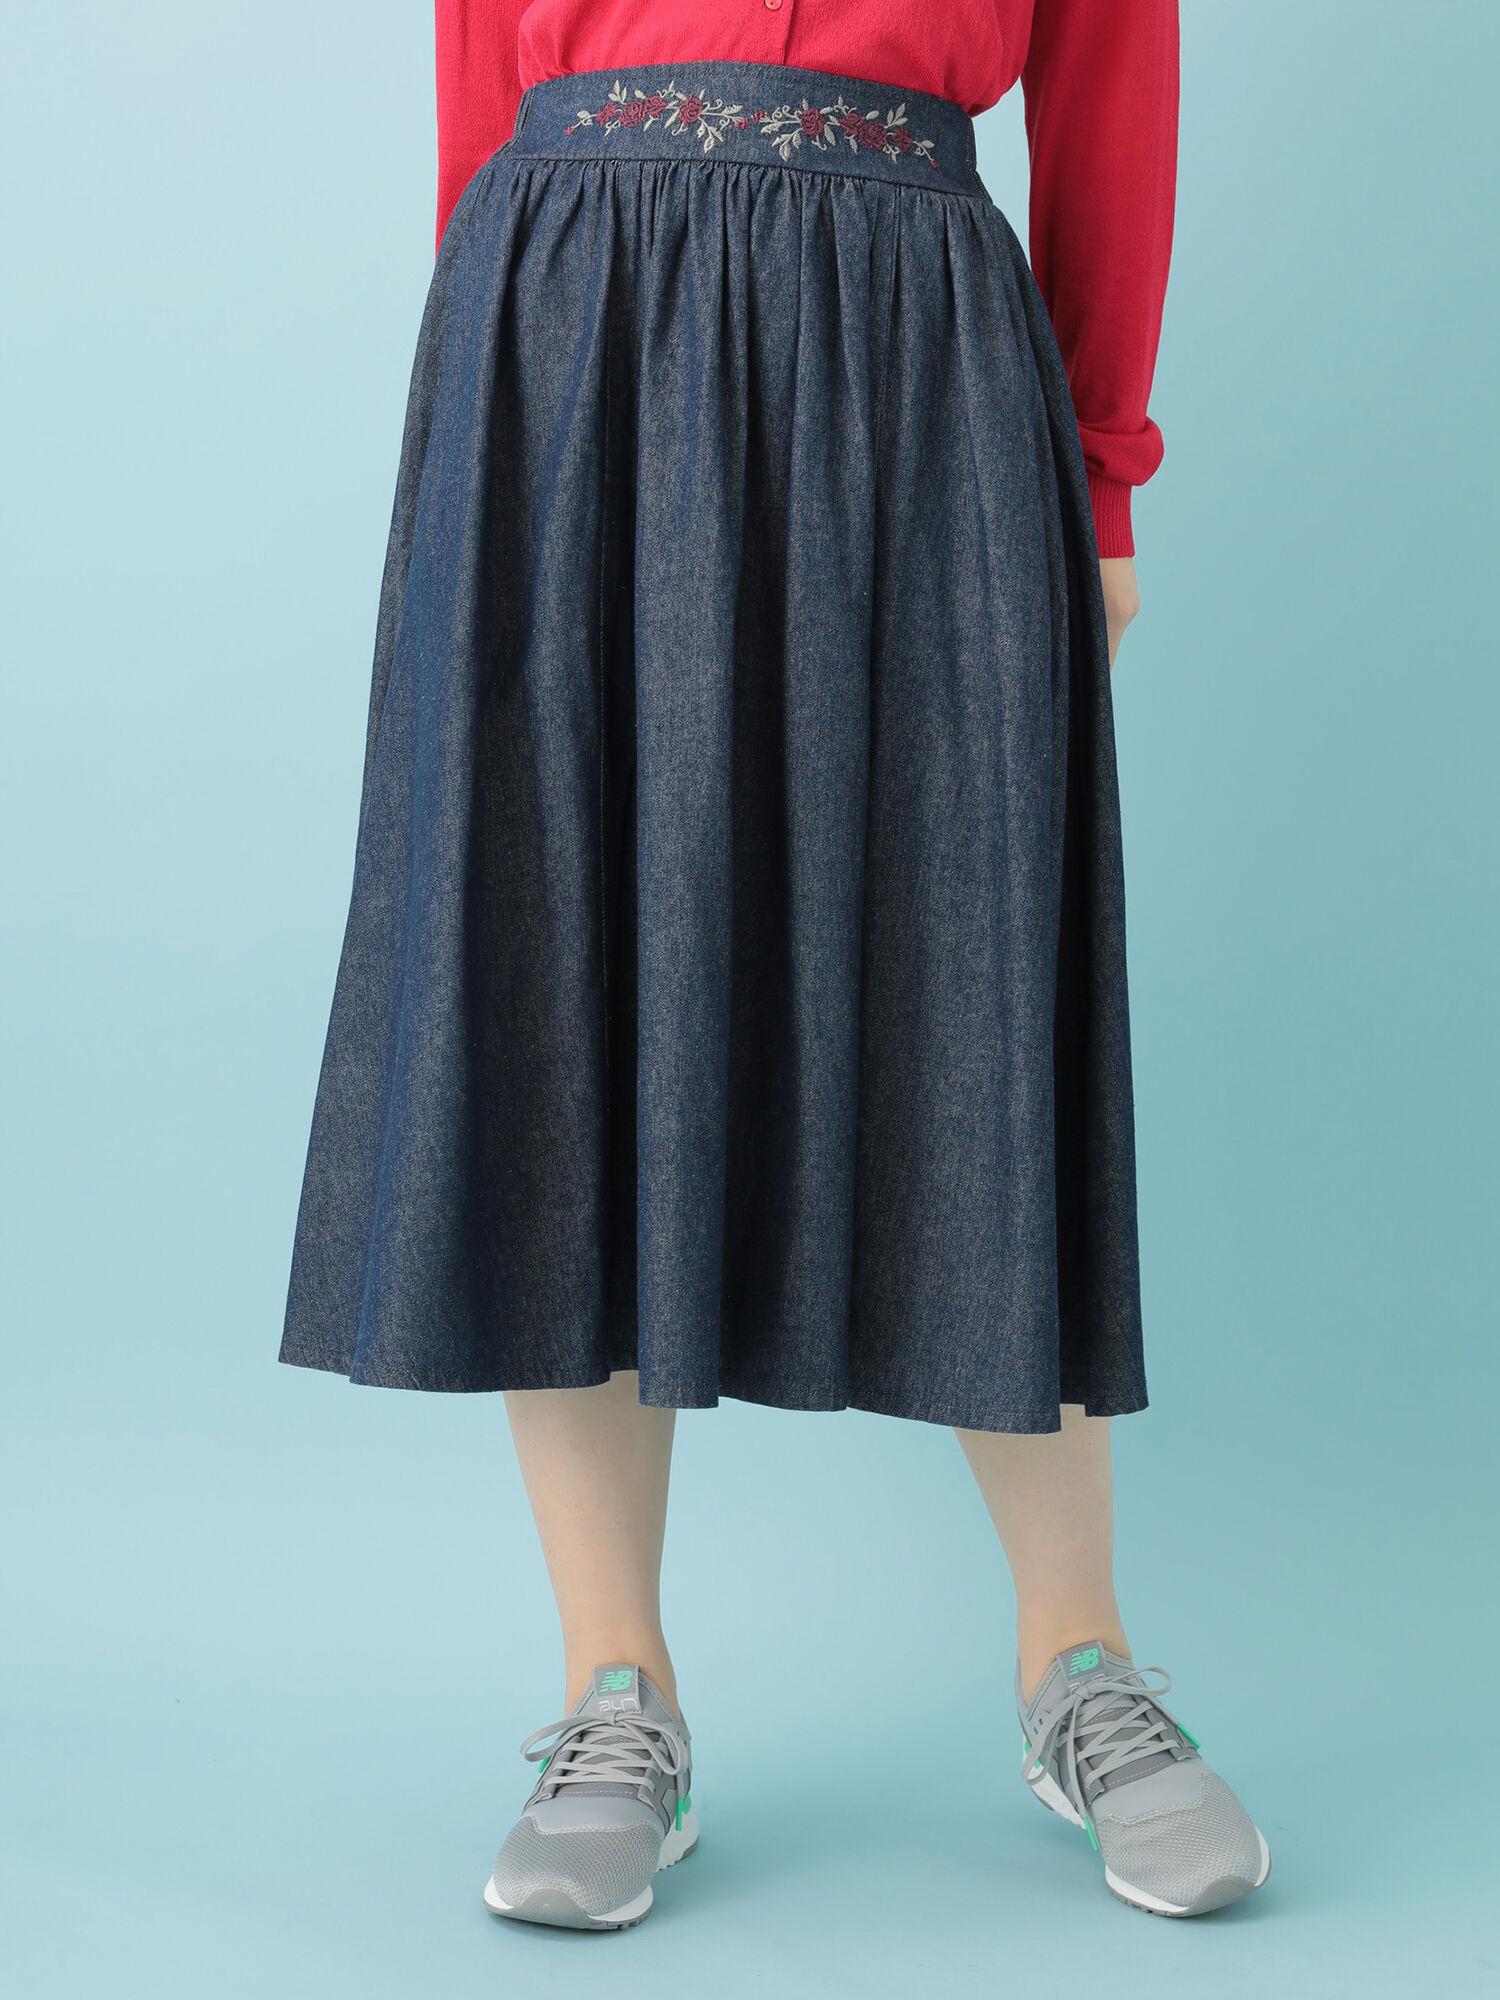 WinHeart・ウエスト花刺しゅうデニムギャザースカート